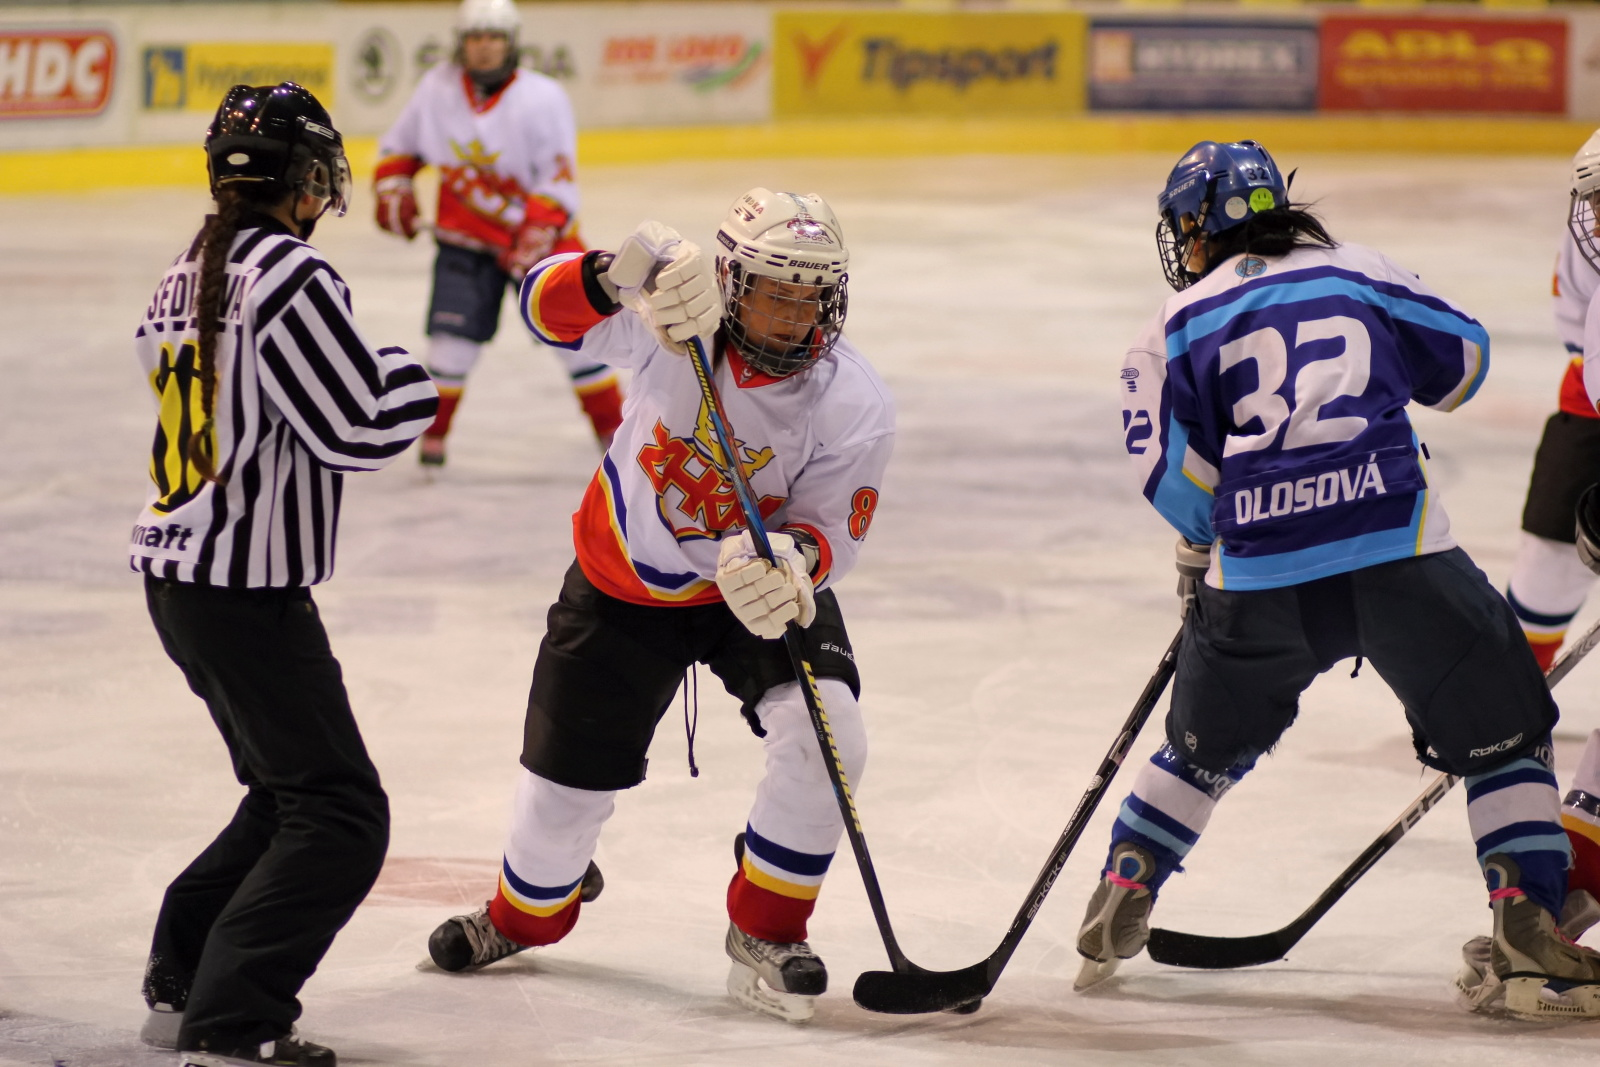 zhkm-zvolen-martin-hokej-2011-4